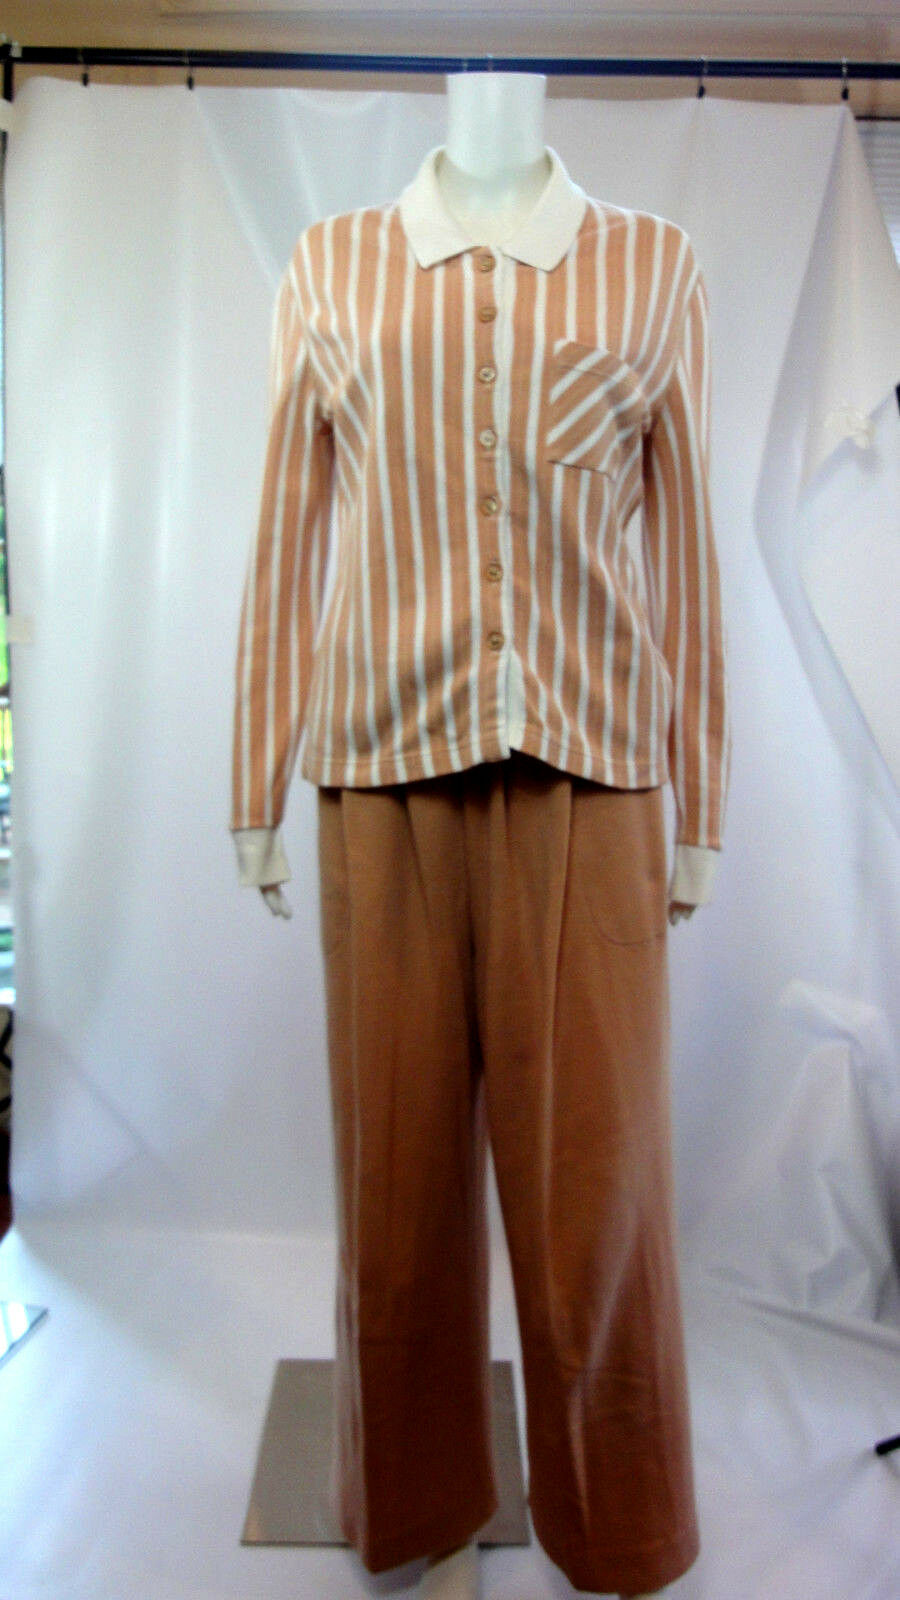 Sonia Rykiel   Pant Suit  Size  Large